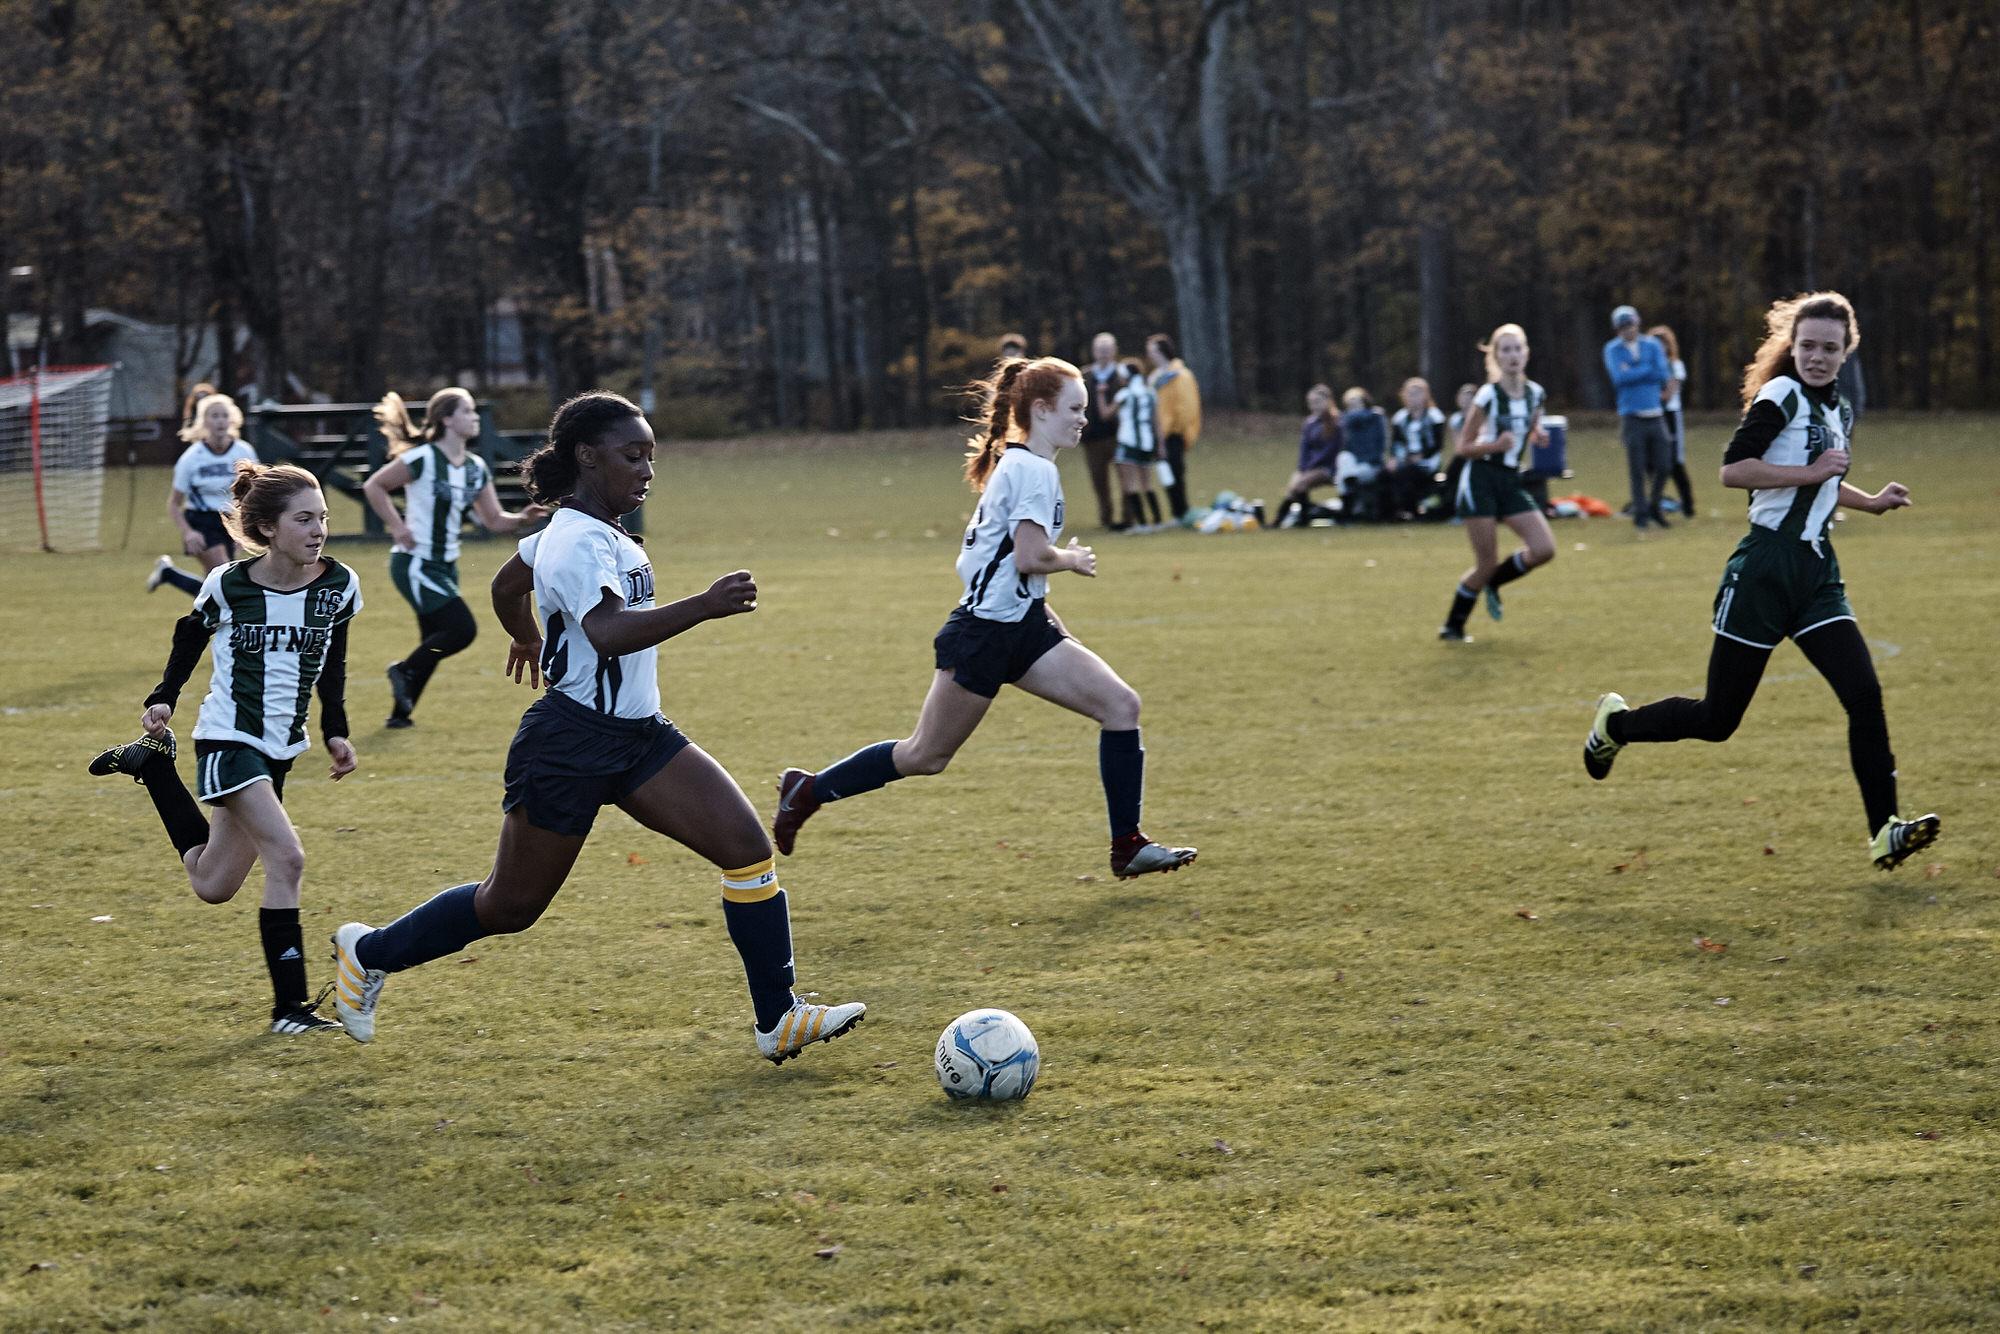 Girls Varsity Soccer vs. Putney School - October 26, 2018 - 040.jpg